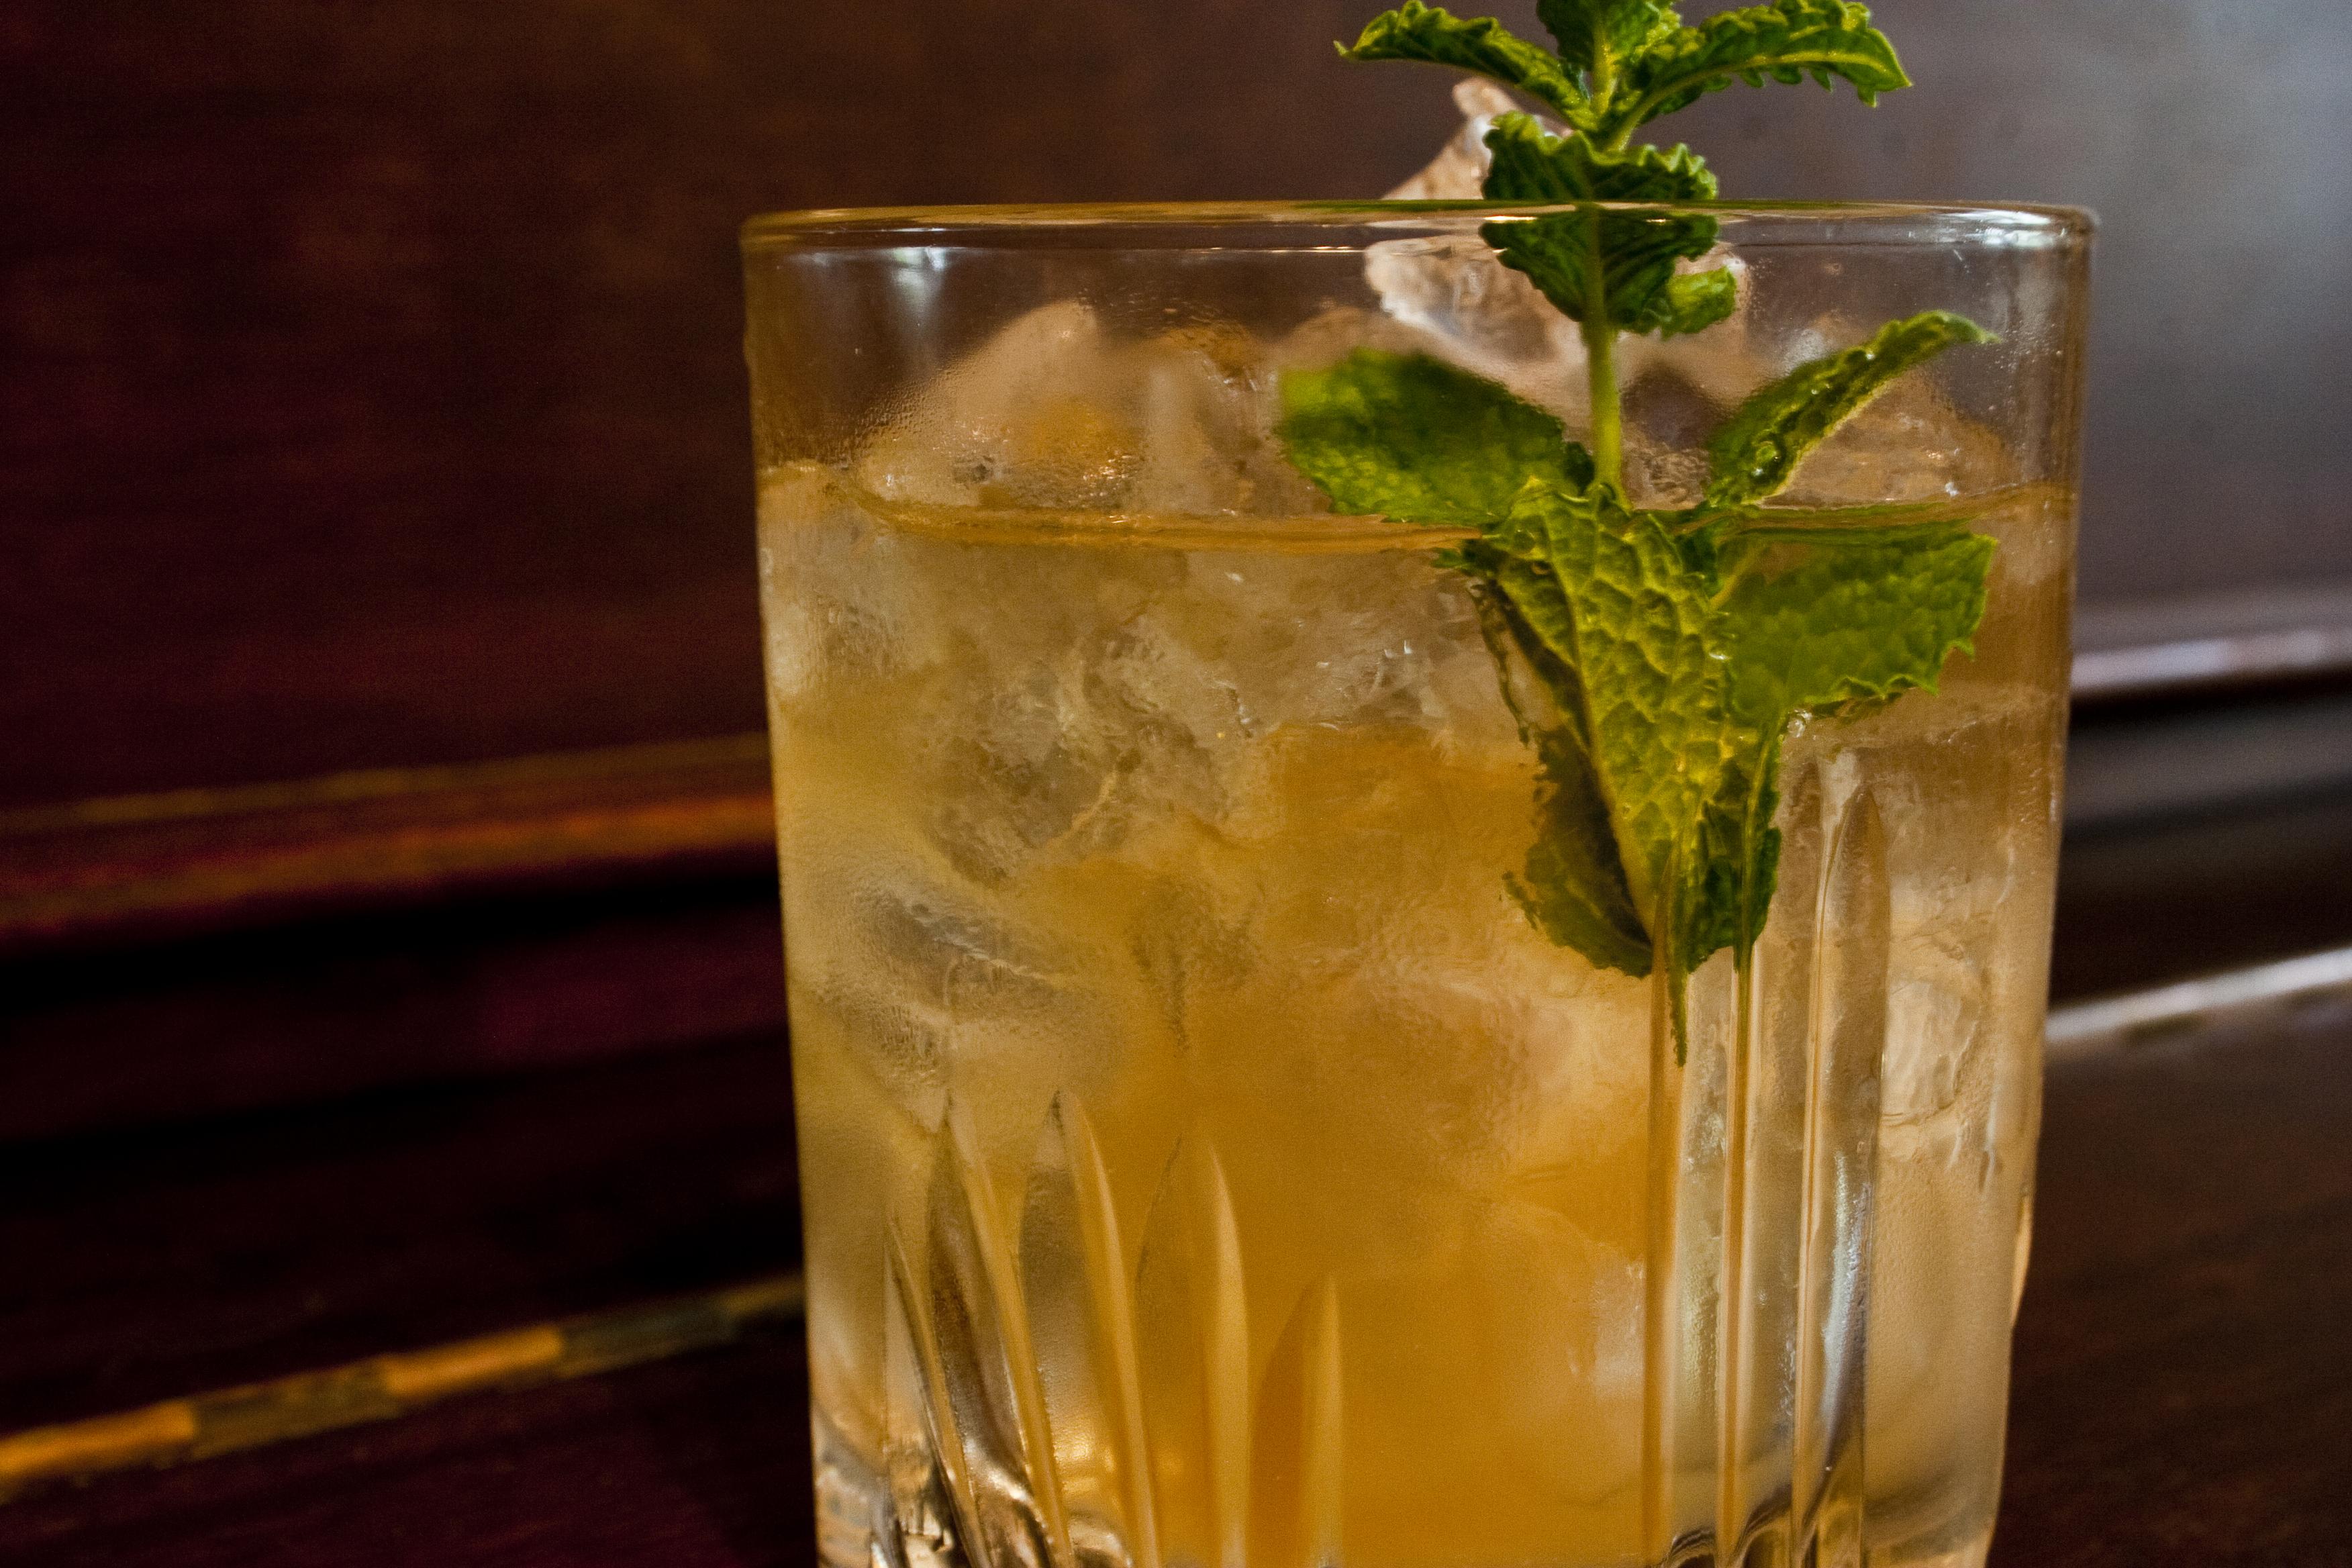 julep mint julep cognac mint julep cocktail cognac julep image cognac ...